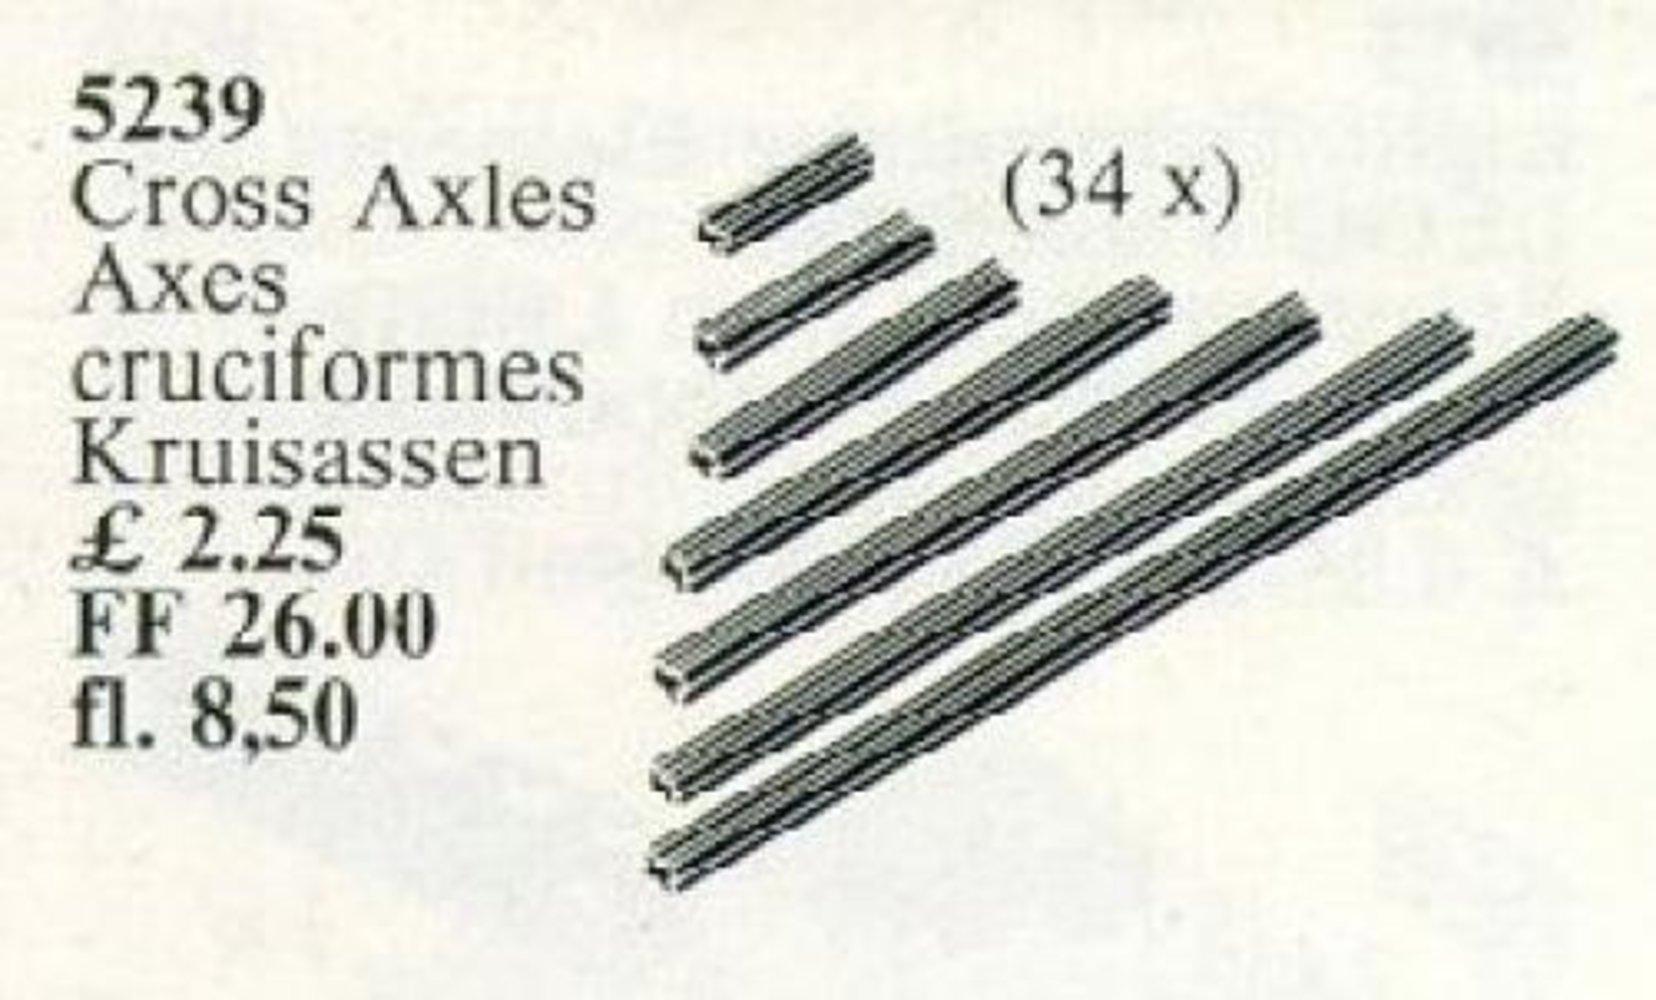 Cross Axles